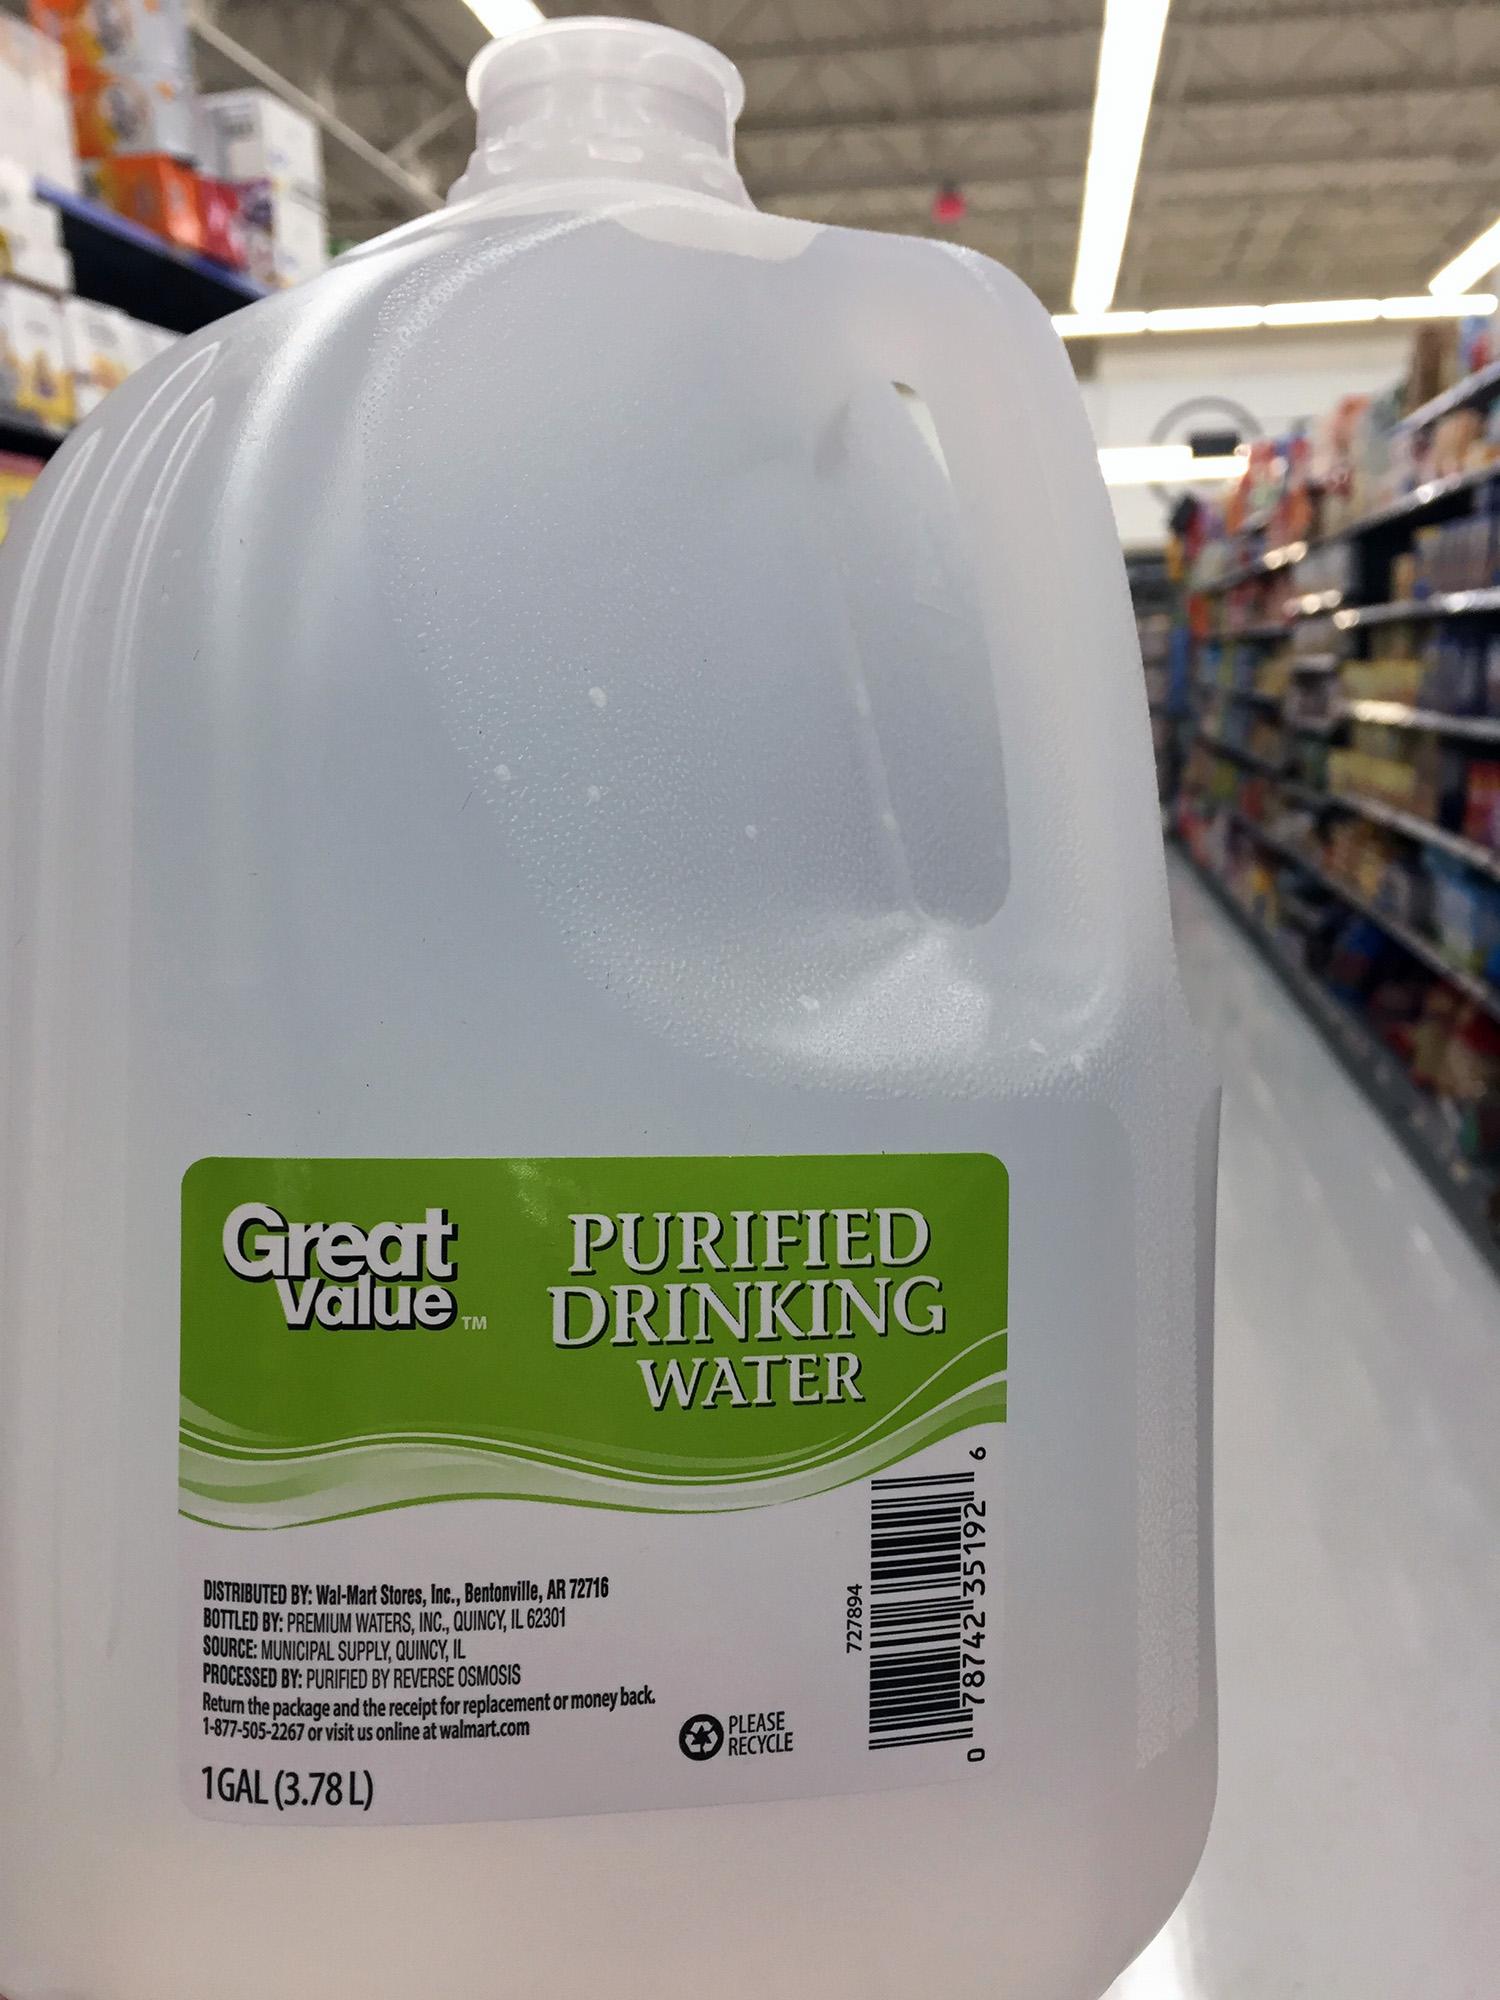 Store brand Water - 1 Gallon